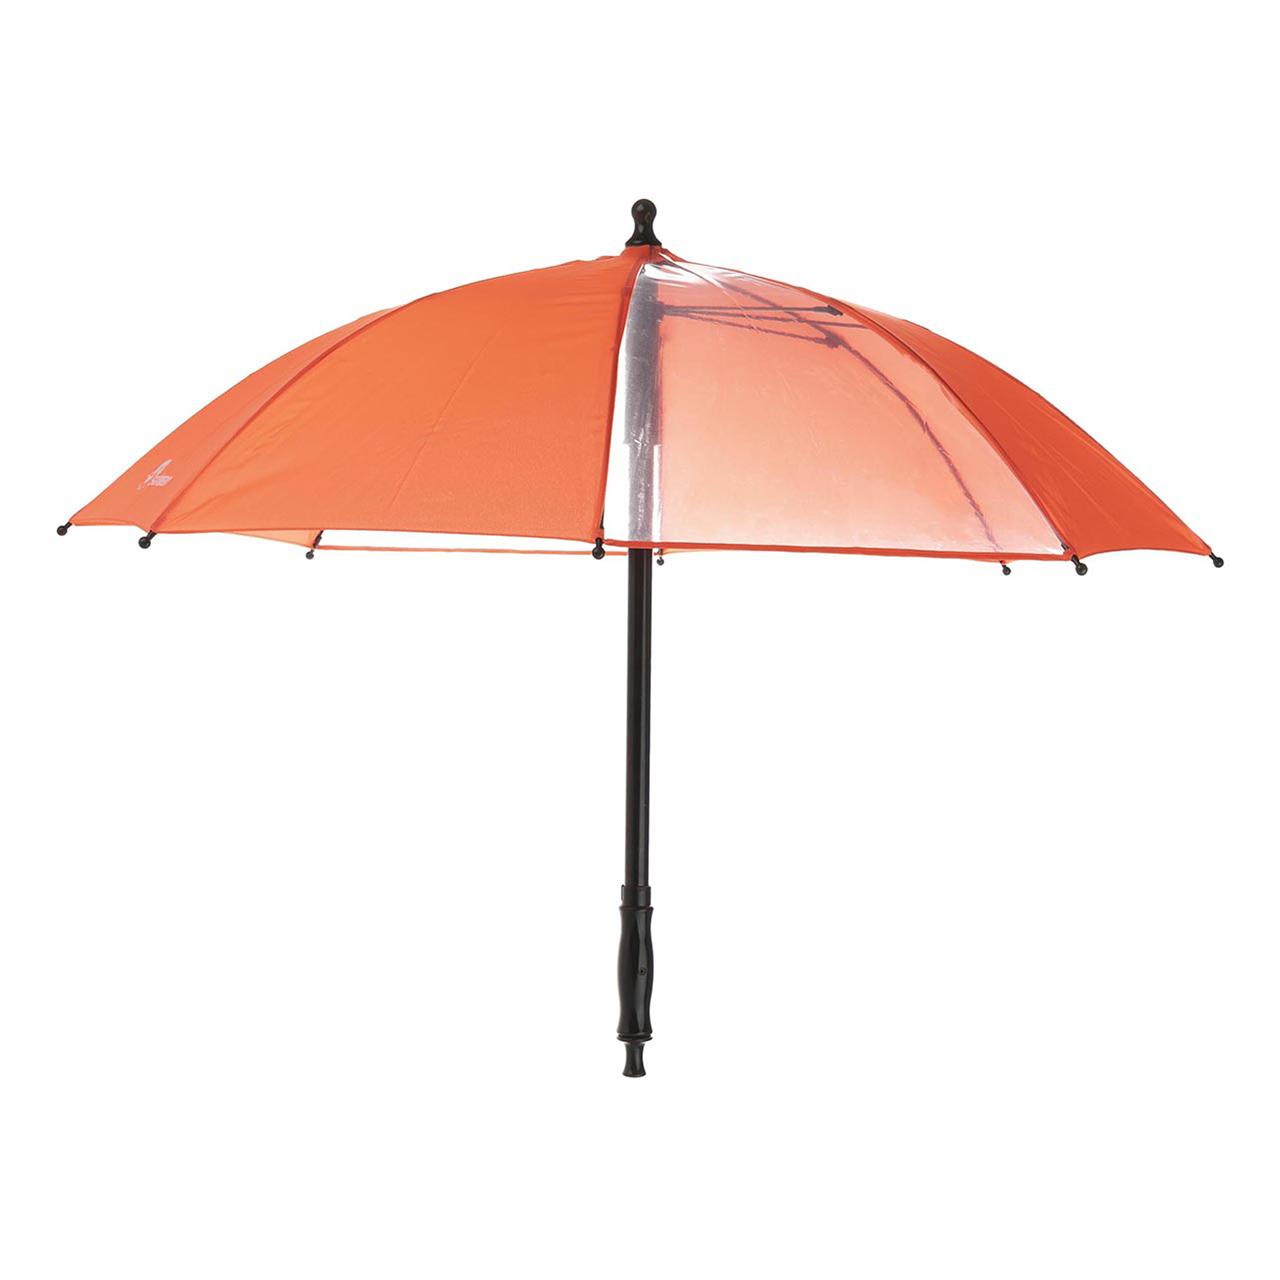 چتر آبپاش شوان کد ۱-۷۱۲